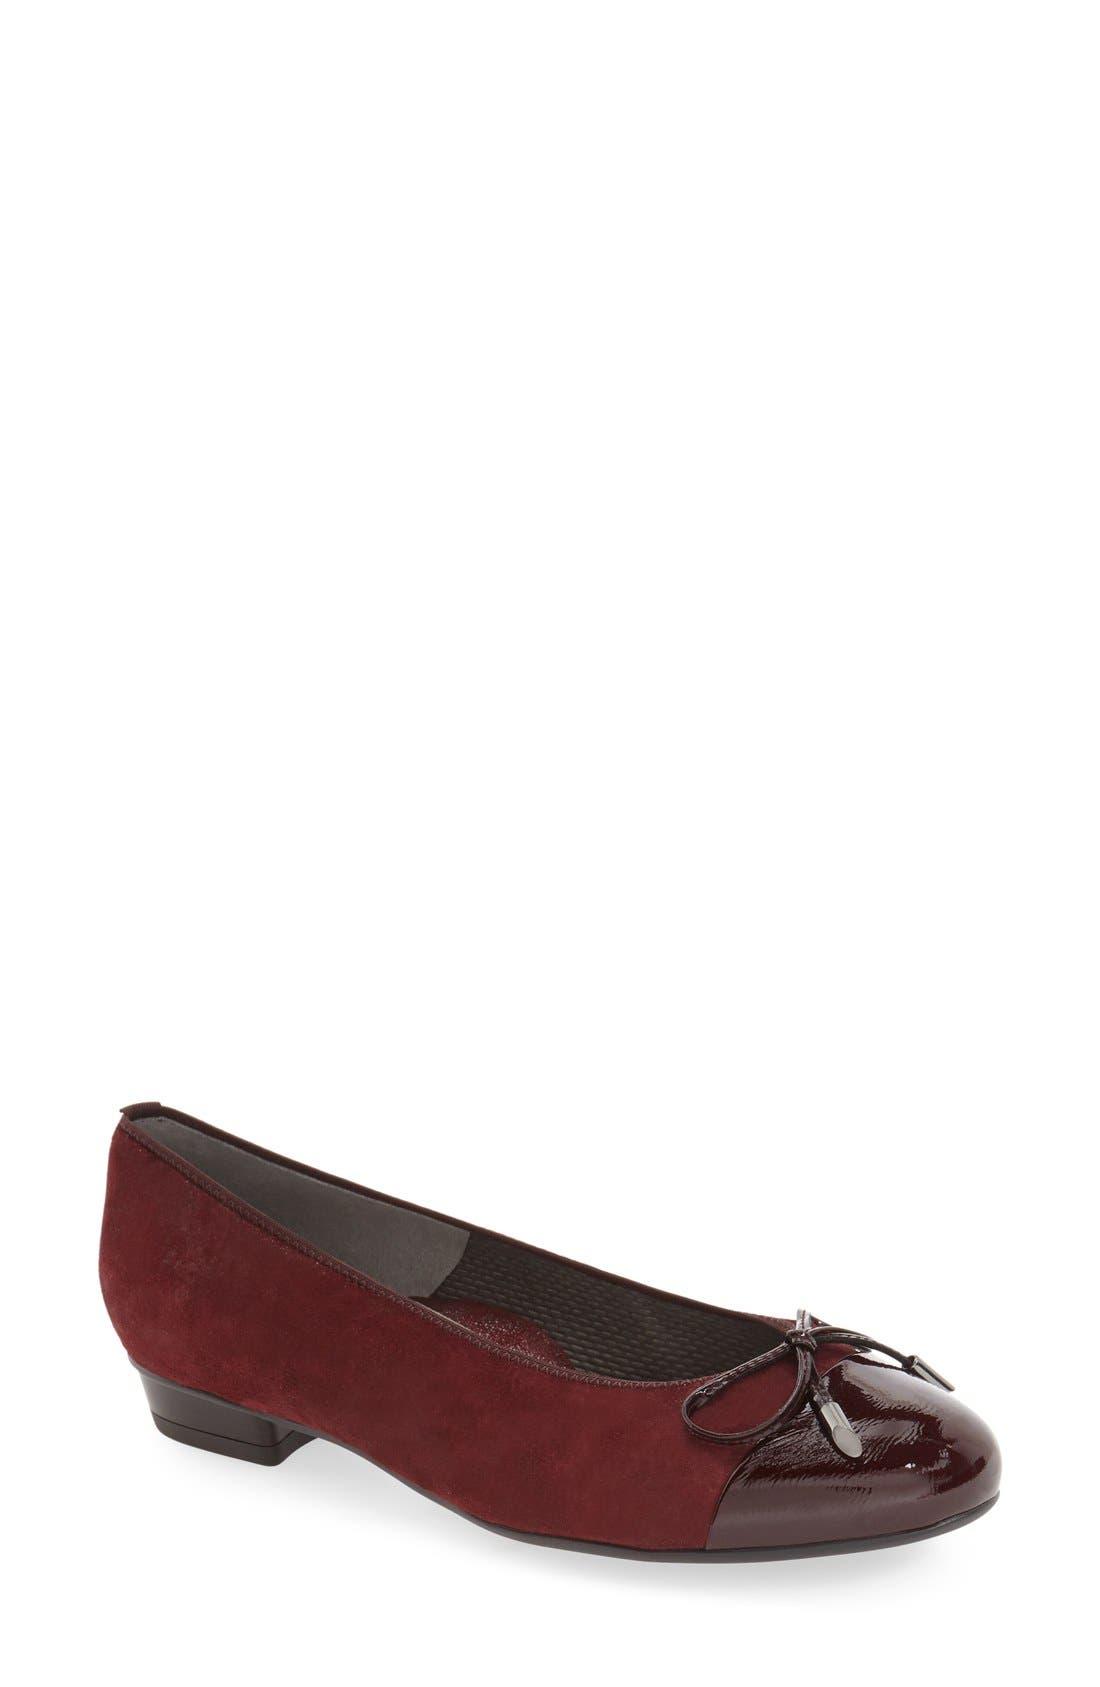 'Betty' Cap Toe Flat,                             Main thumbnail 1, color,                             Burgundy Patent Leather